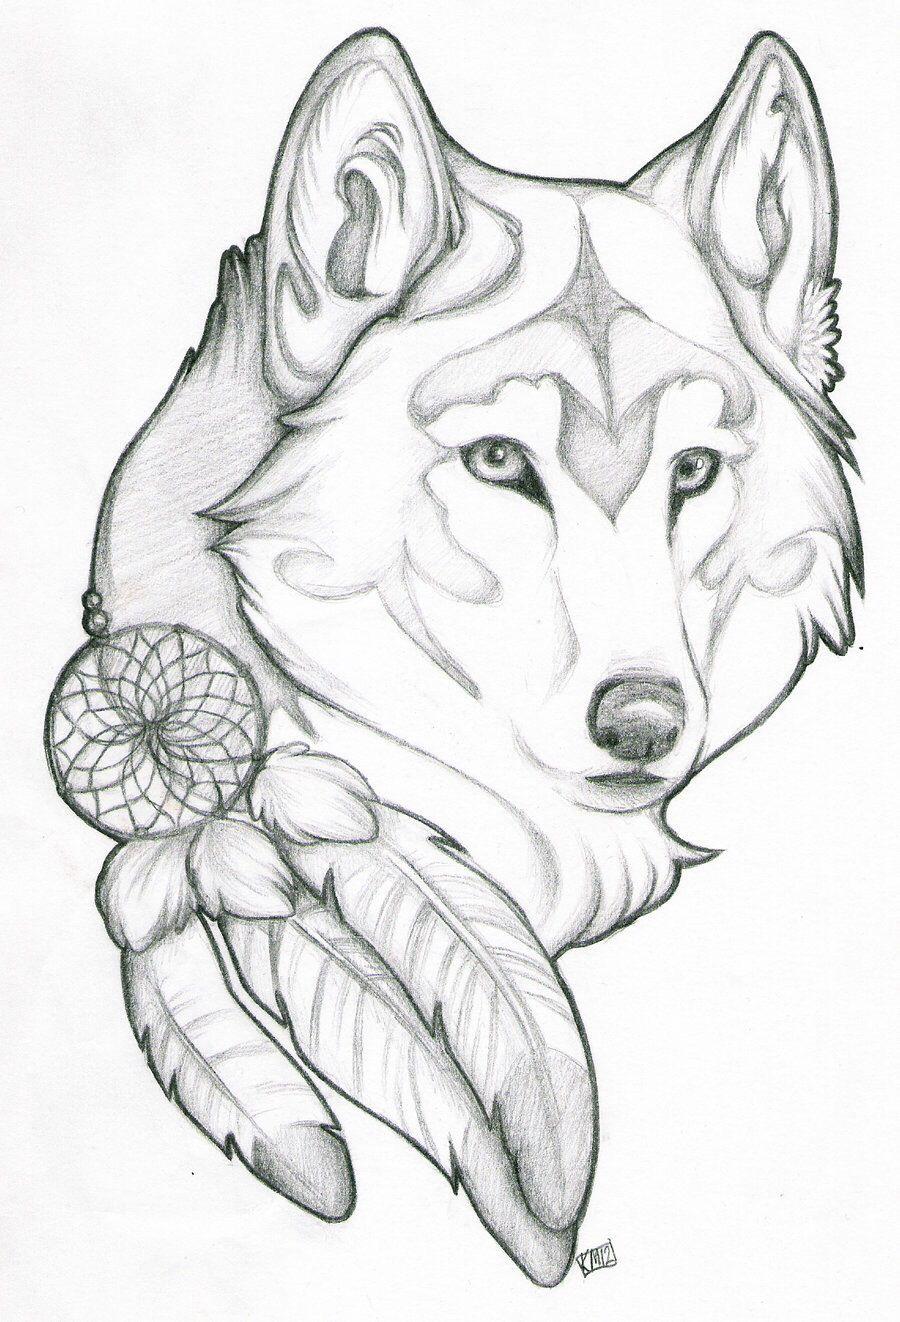 Lobo Con Plumas De Tocada De Cacique Mas Cerca Del Concepto Para